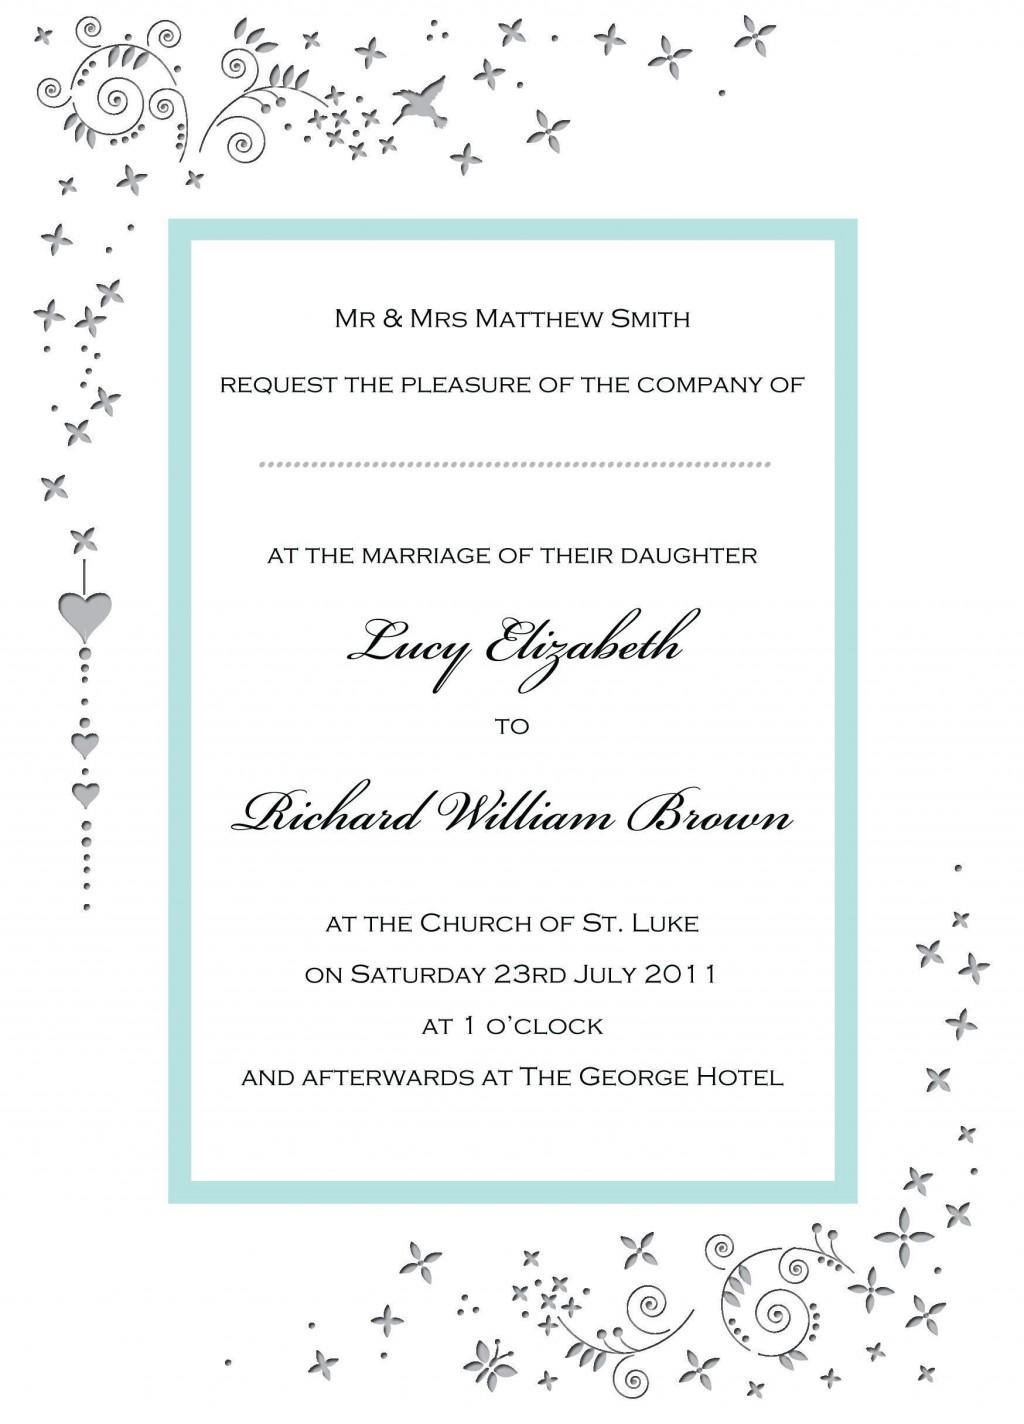 001 Rare Microsoft Word Invitation Template Image  Templates Baby Shower Free Graduation Announcement For WeddingLarge